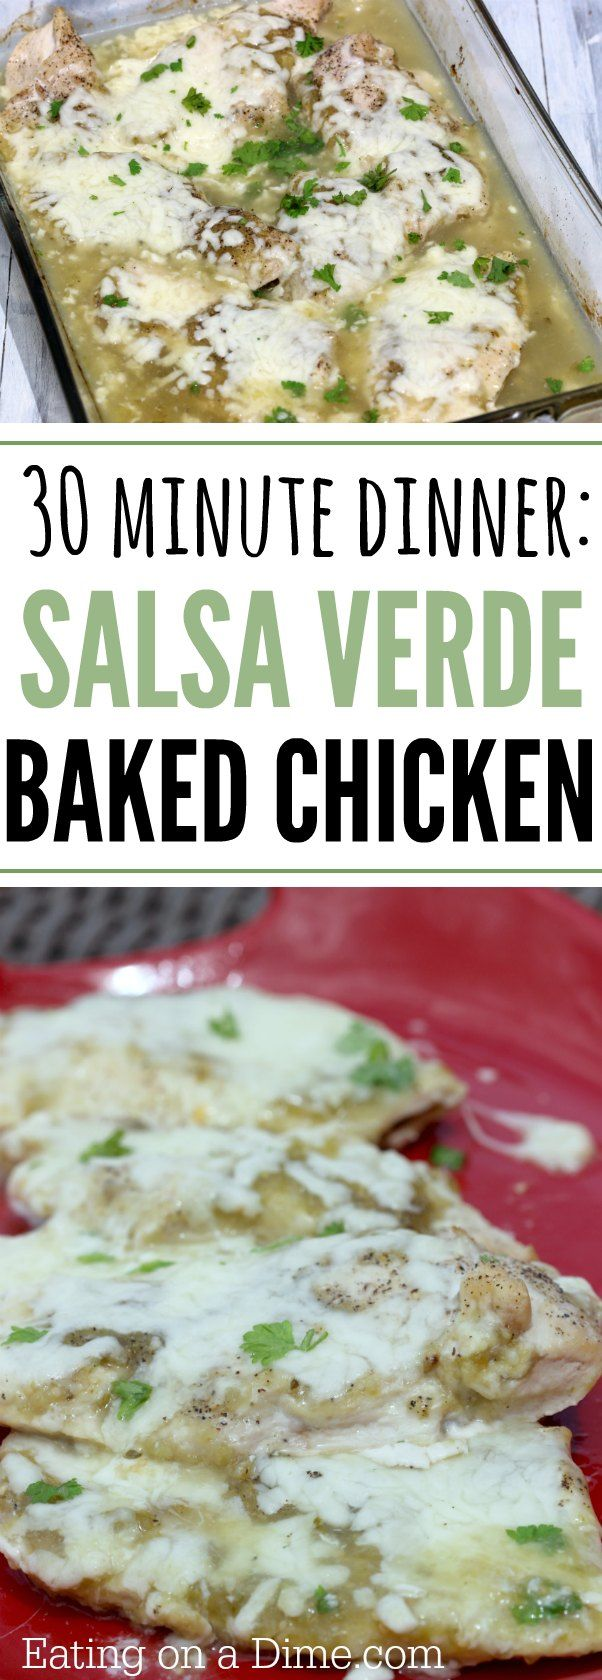 Easy chicken dinner! Salsa Verde baked chicken recipe. This salsa verde chicken is easy and delicious. We love the verde sauce over everything!